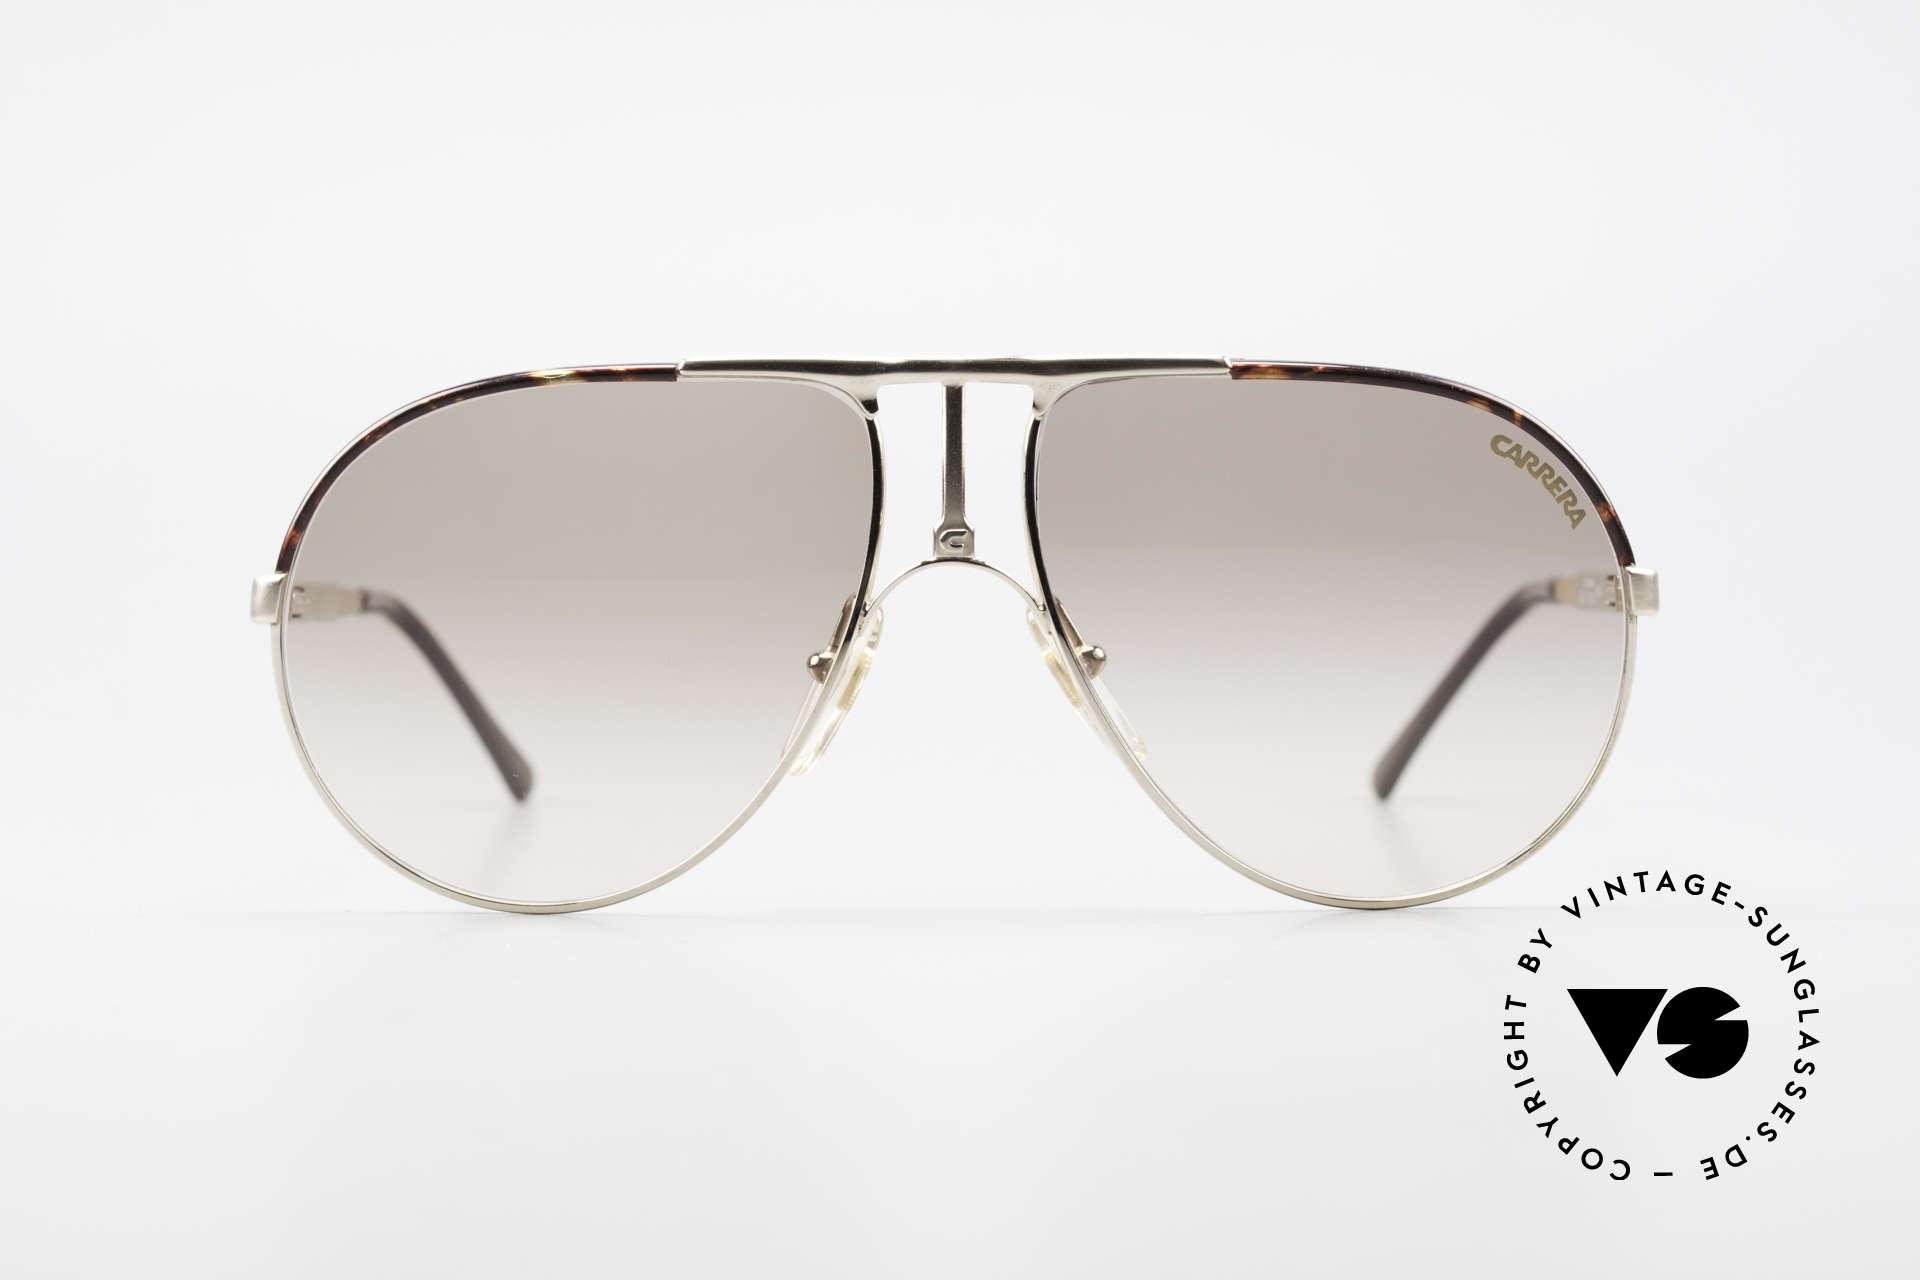 Carrera 5306 Brad Pitt Vintage Sunglasses, adjustable temple-length thanks to Carrera Vario system, Made for Men and Women